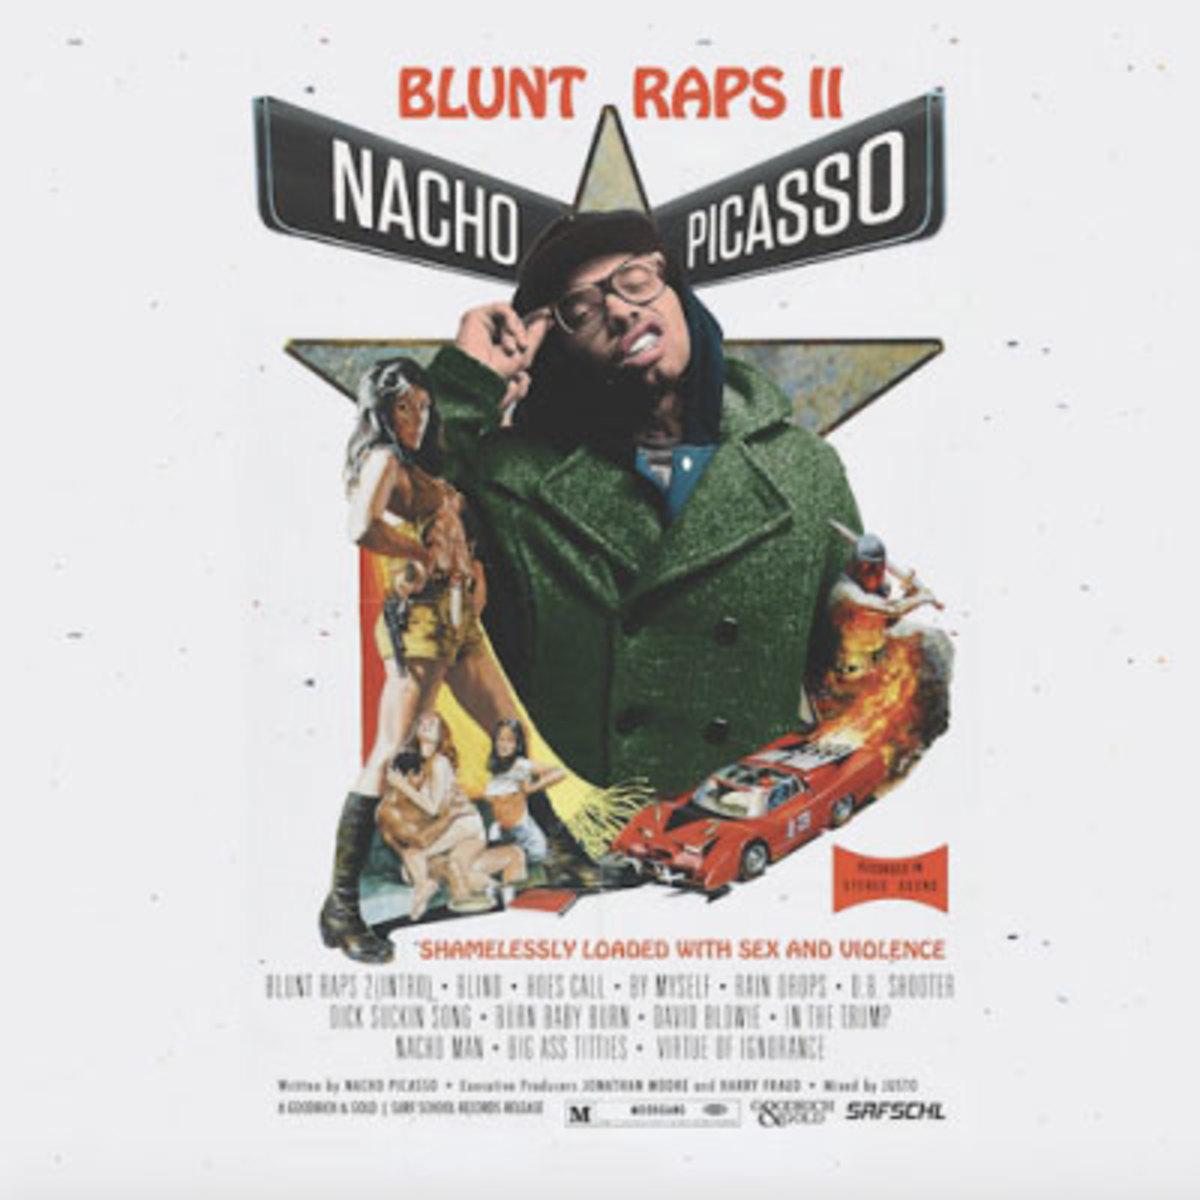 nacho-picasso-blunt-raps-ii.jpg